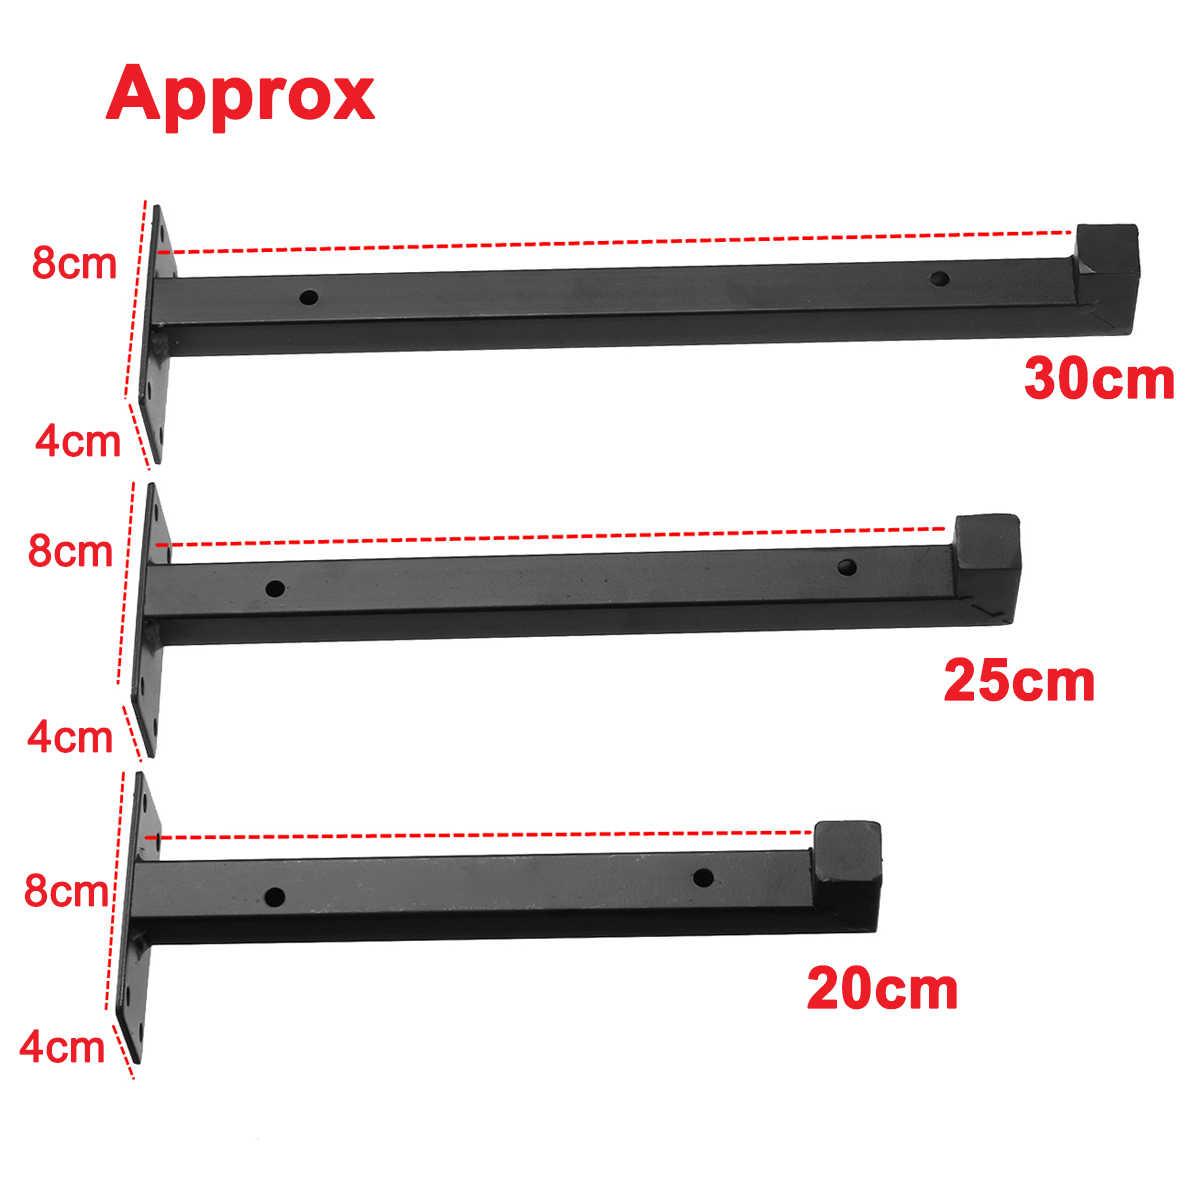 2pcs 벽 마운트 선반 브래킷 헤비 듀티 산업용 철 발판 보드 플로팅 브래킷 가구 20 cm/25 cm/30 cm